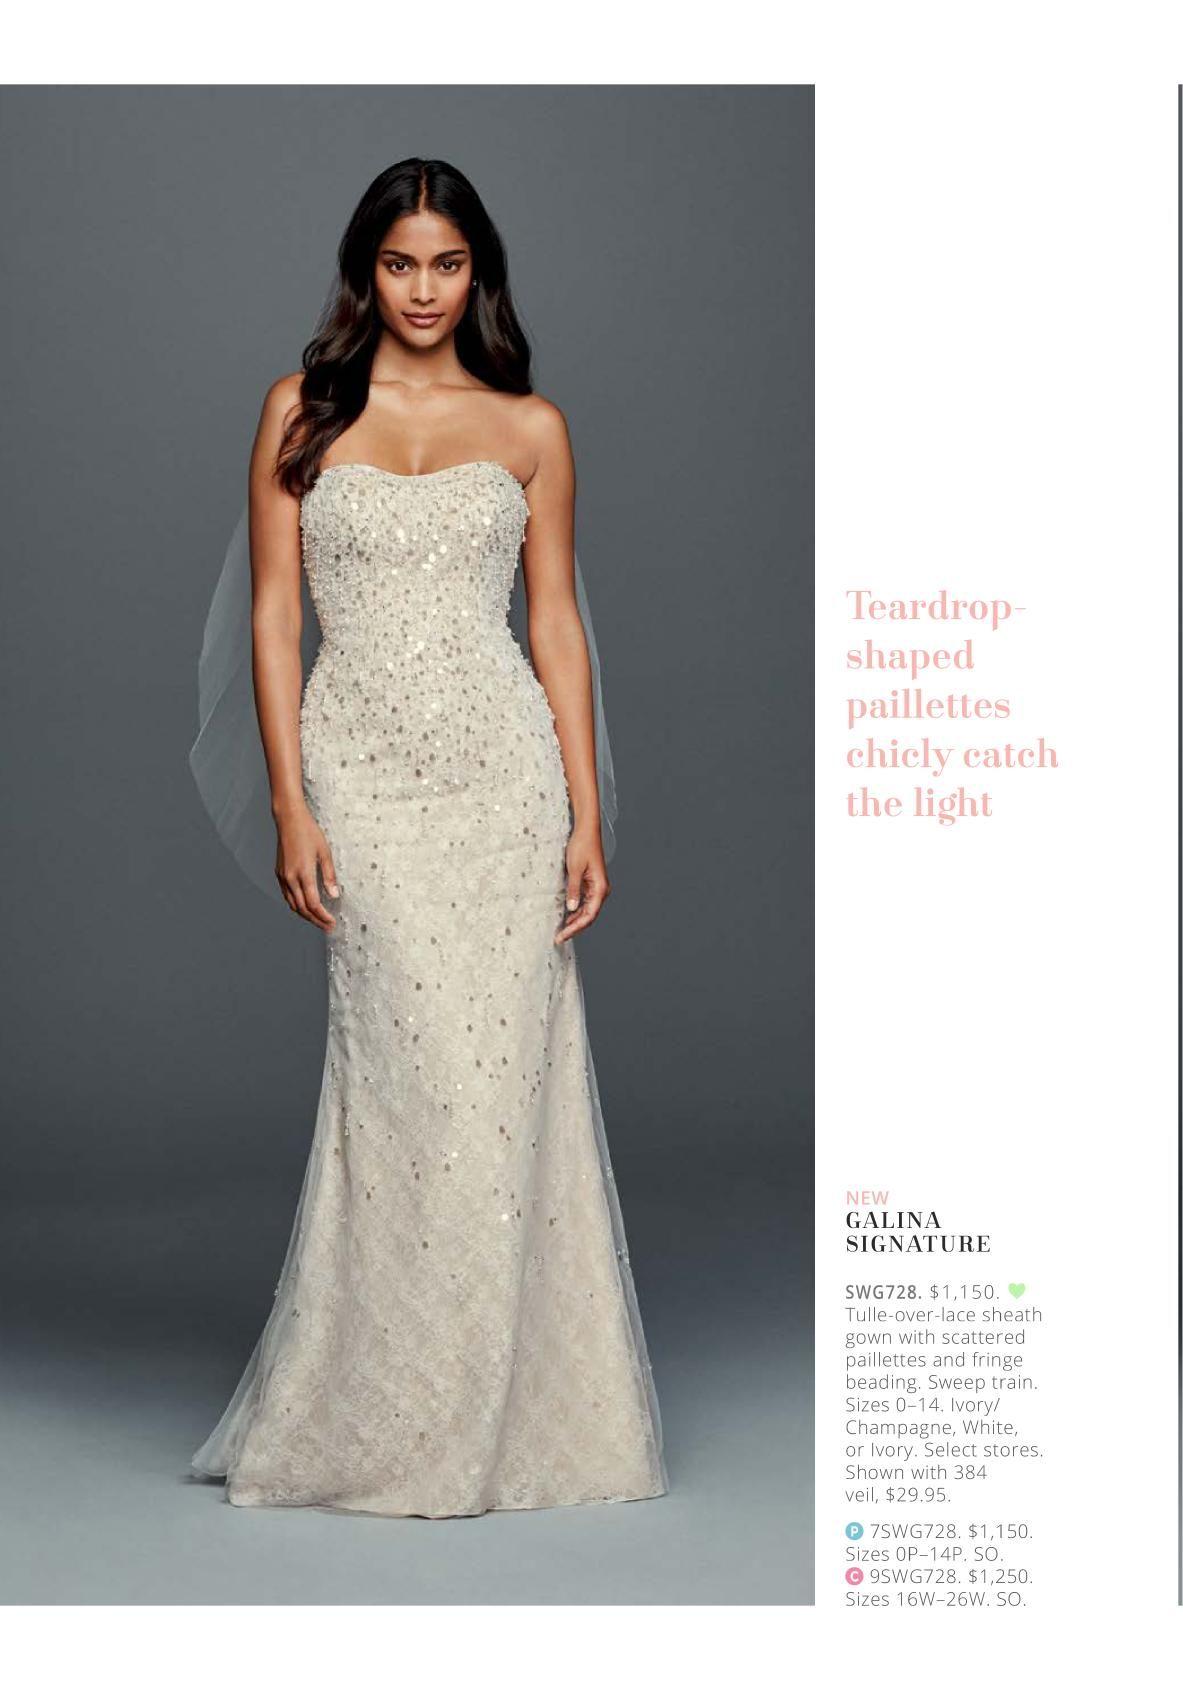 db57ac38 Champagne color works for medium/dark skin tone. Strapless Dress Formal,  Formal Dresses